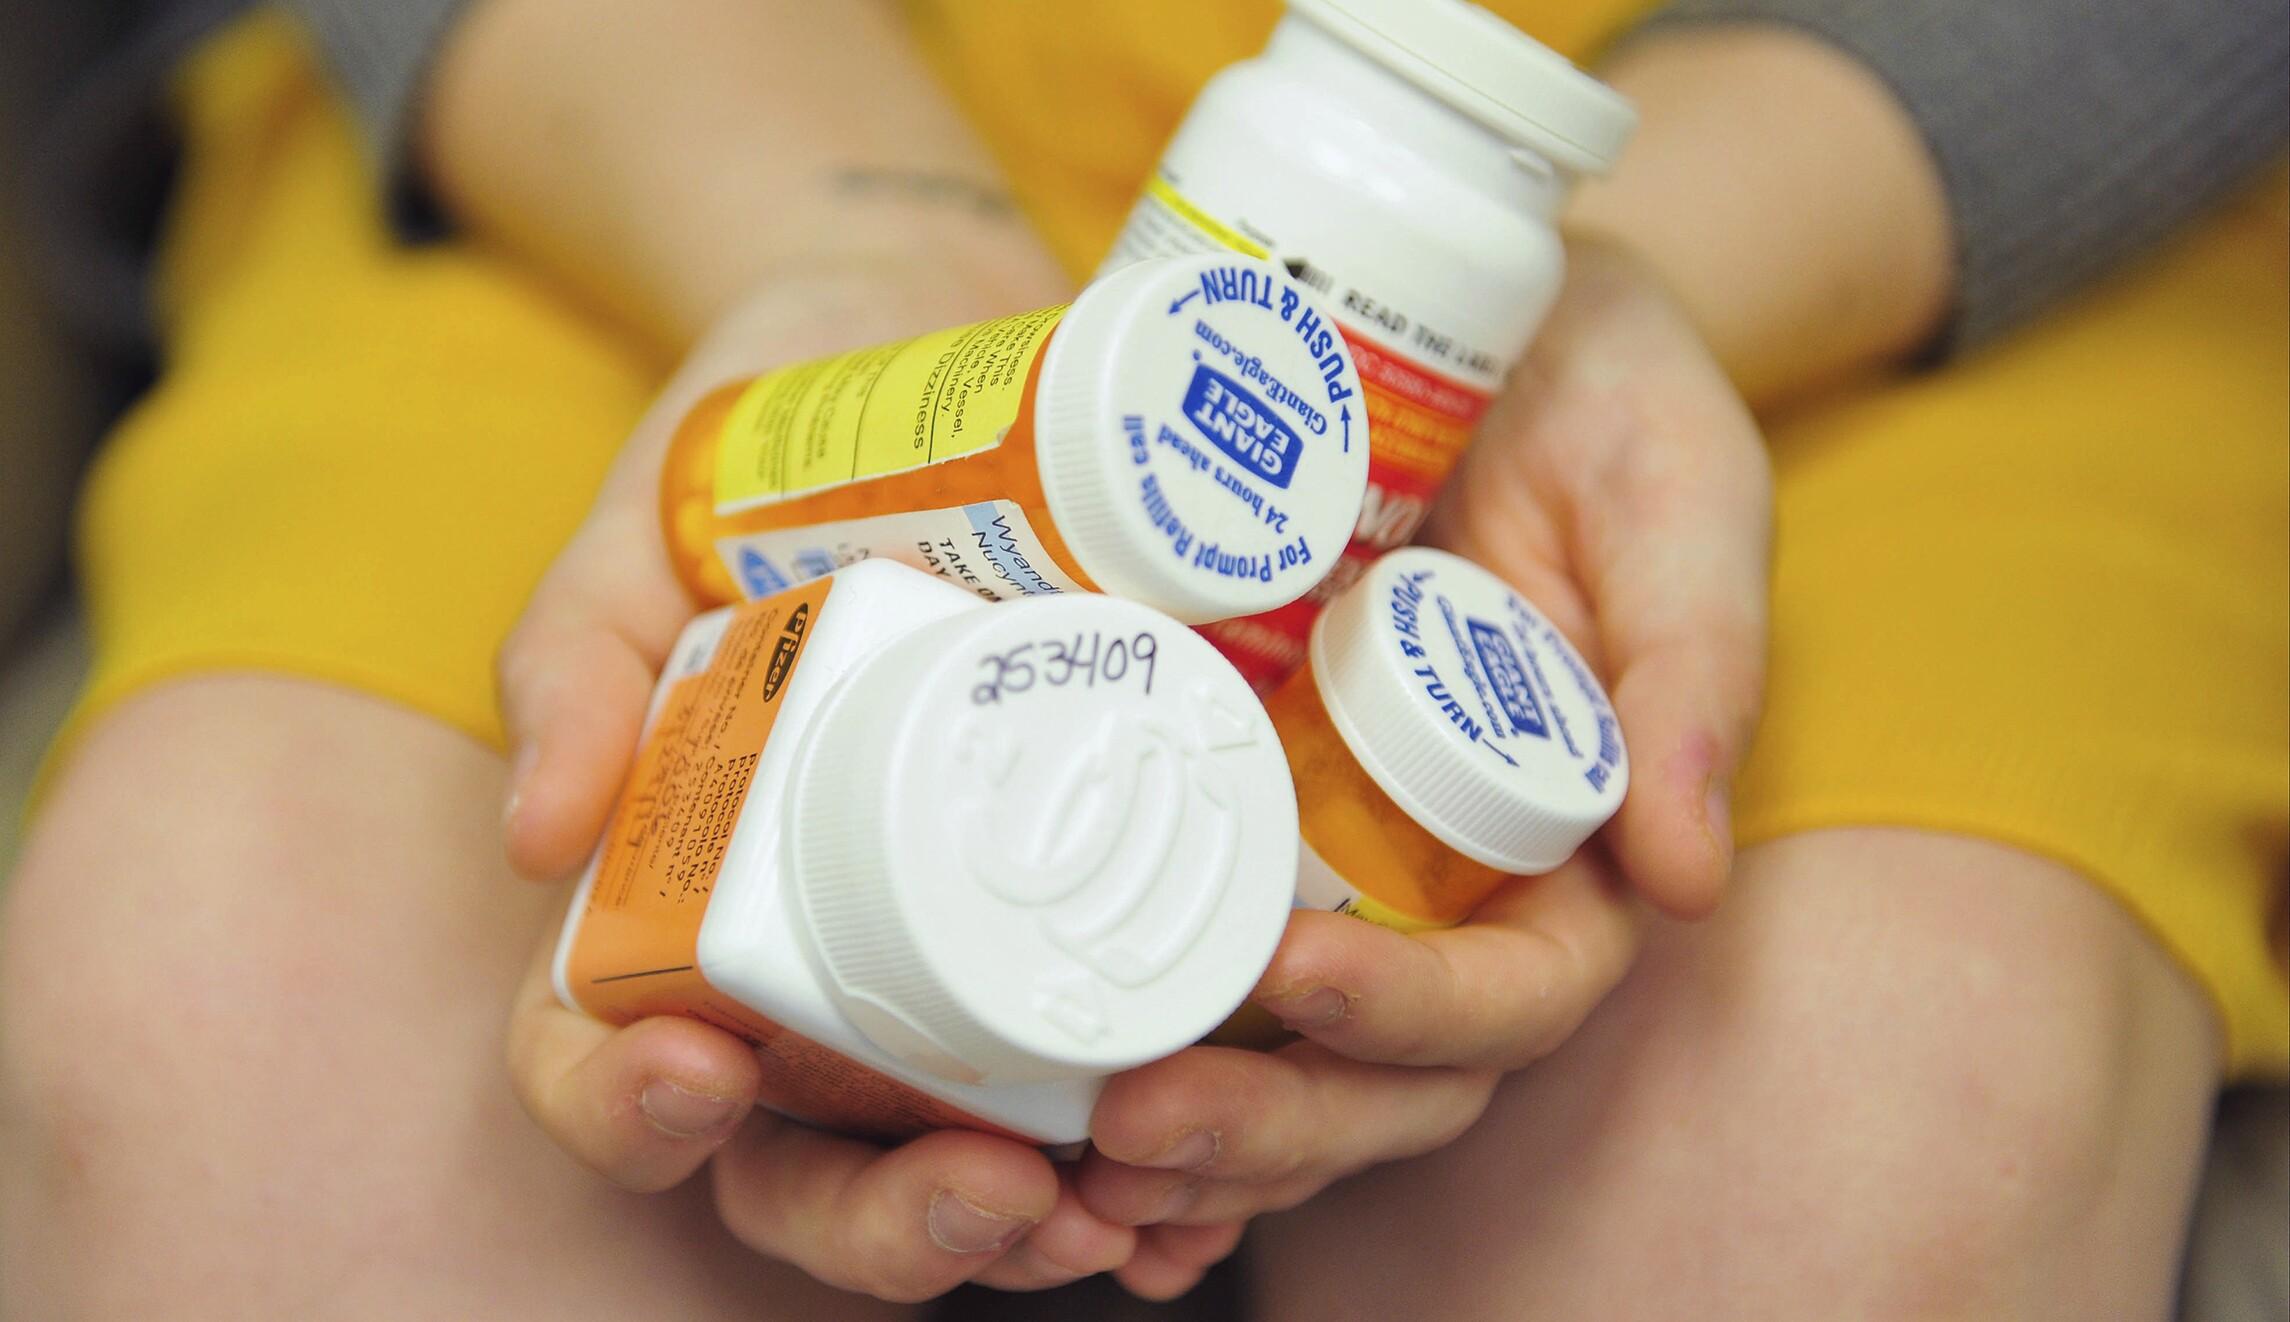 070617 Leonard Opioid pic